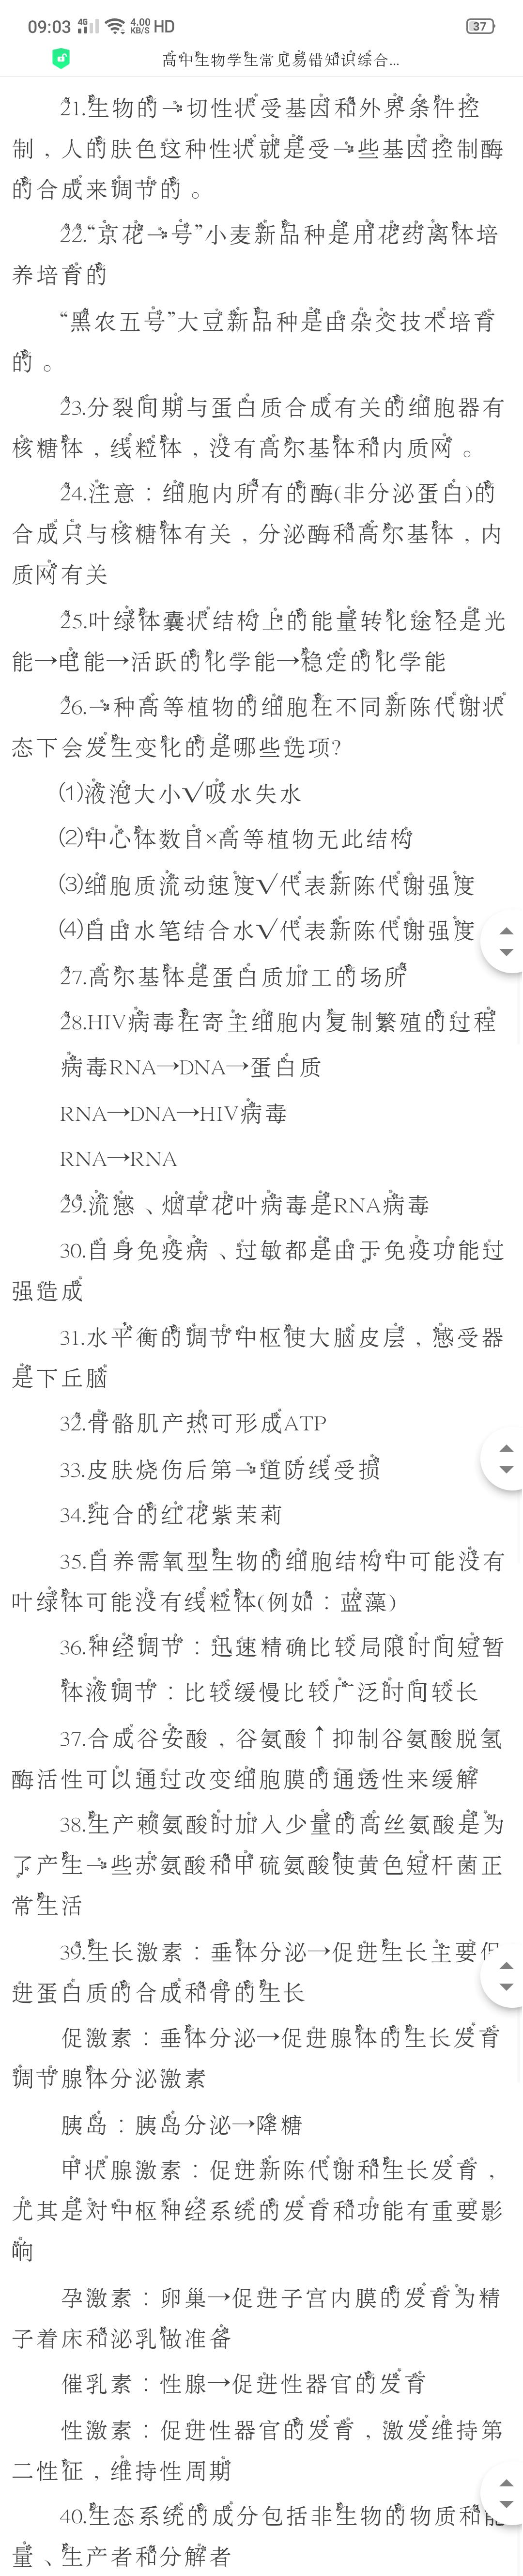 Screenshot_2019-07-26-09-03-10-74.png